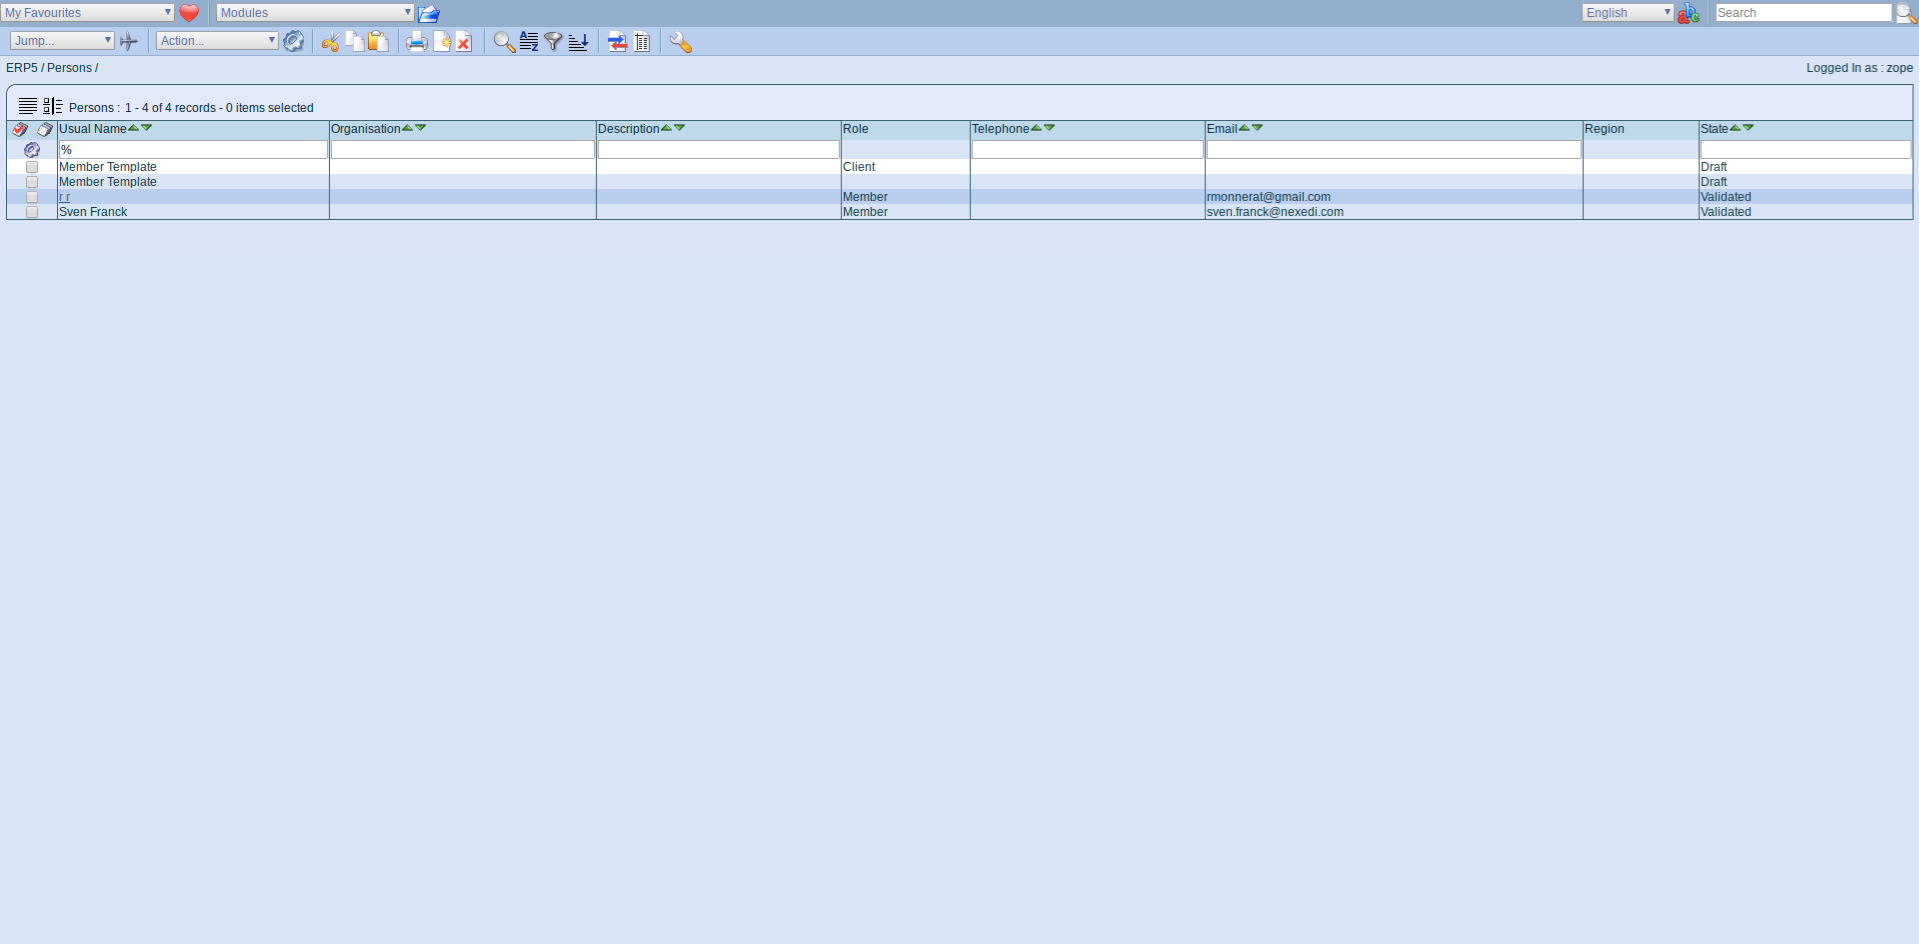 ERP5 Interface - Person Module